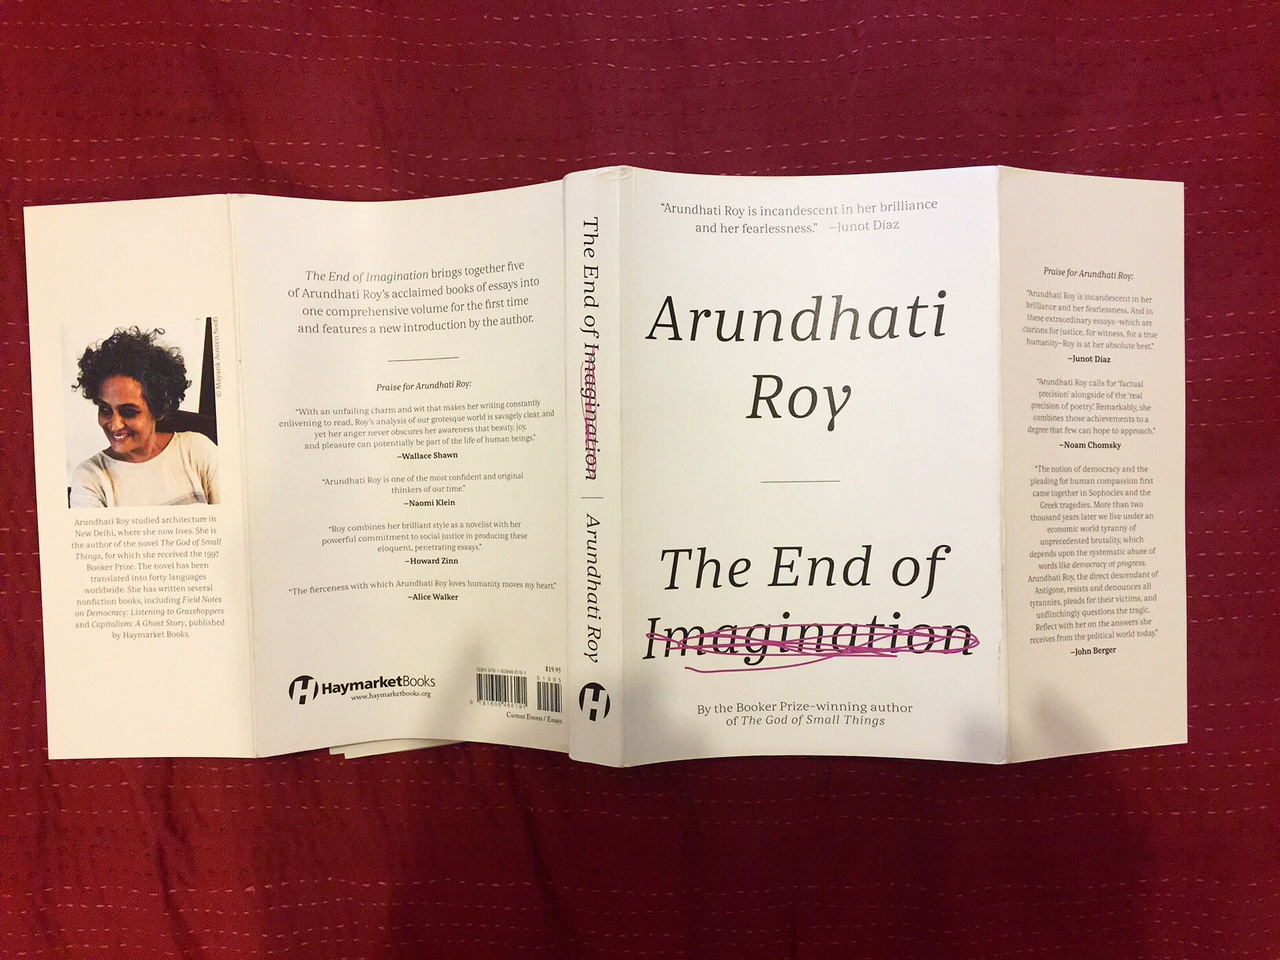 011 Essays By Arundhati Roy Img 3699 Essay Sensational Full